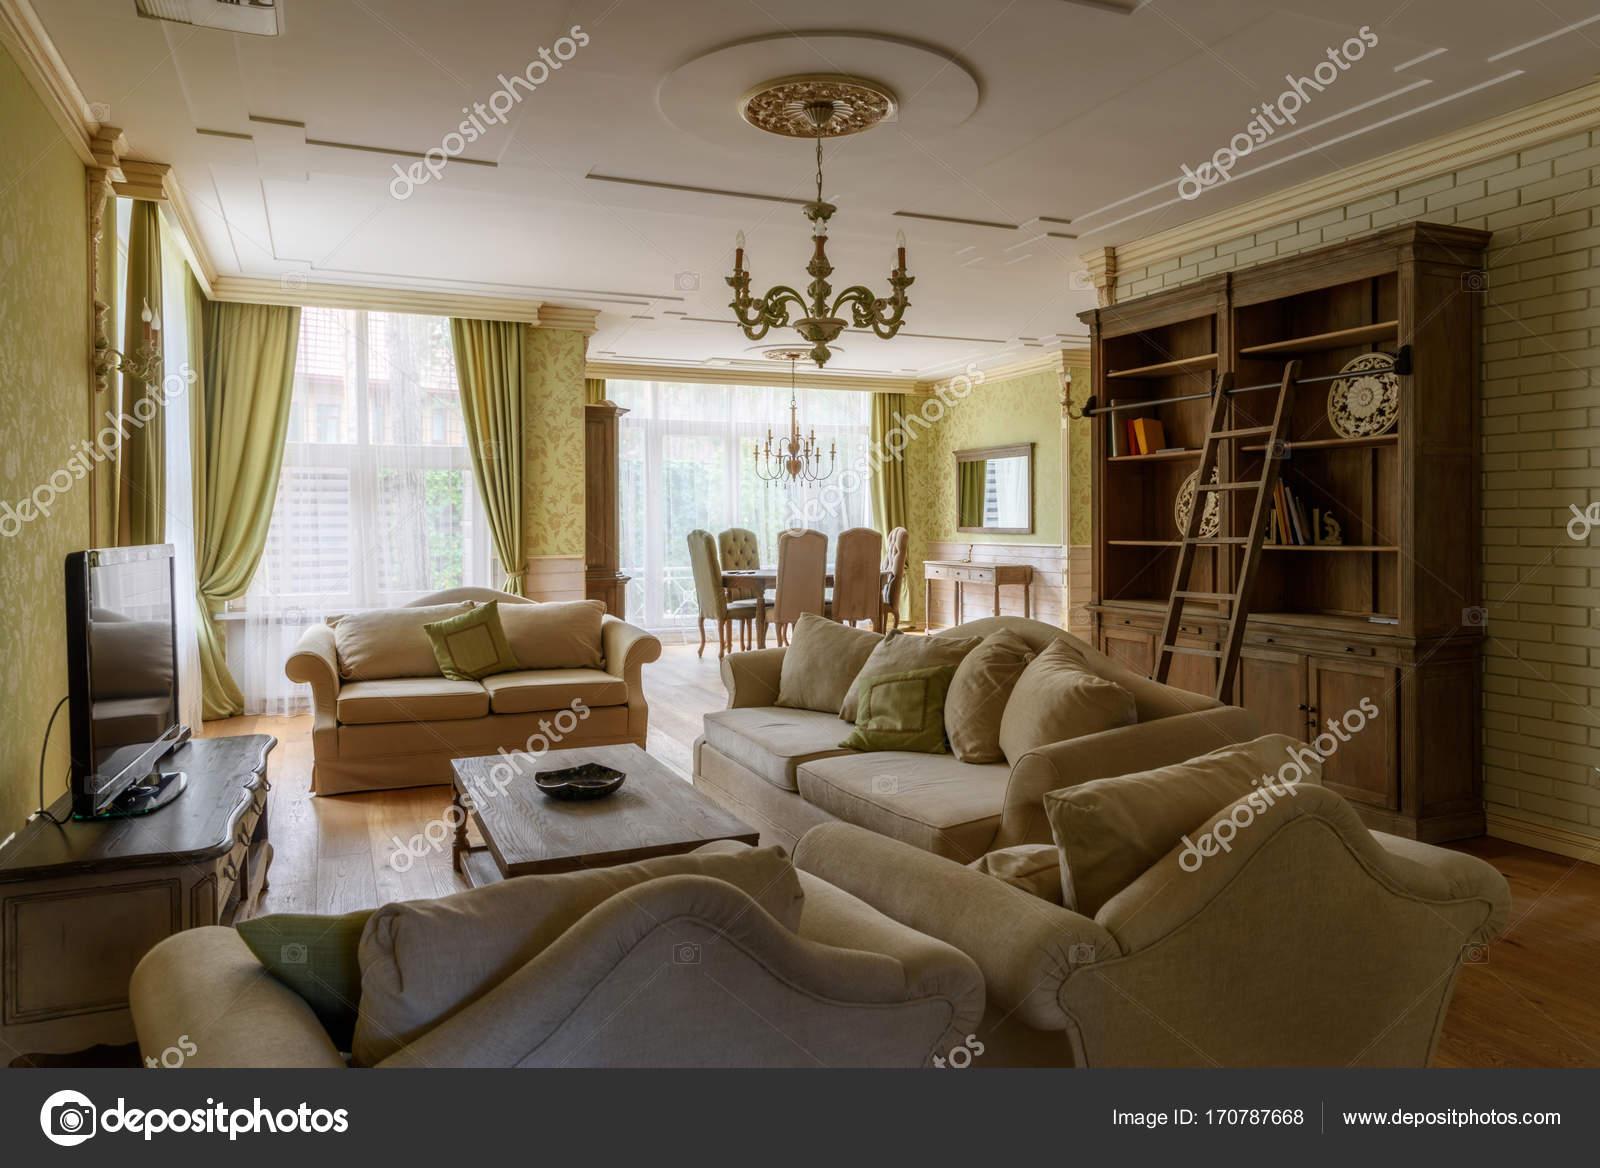 woonkamer interieur — Stockfoto © VitalikRadko #170787668